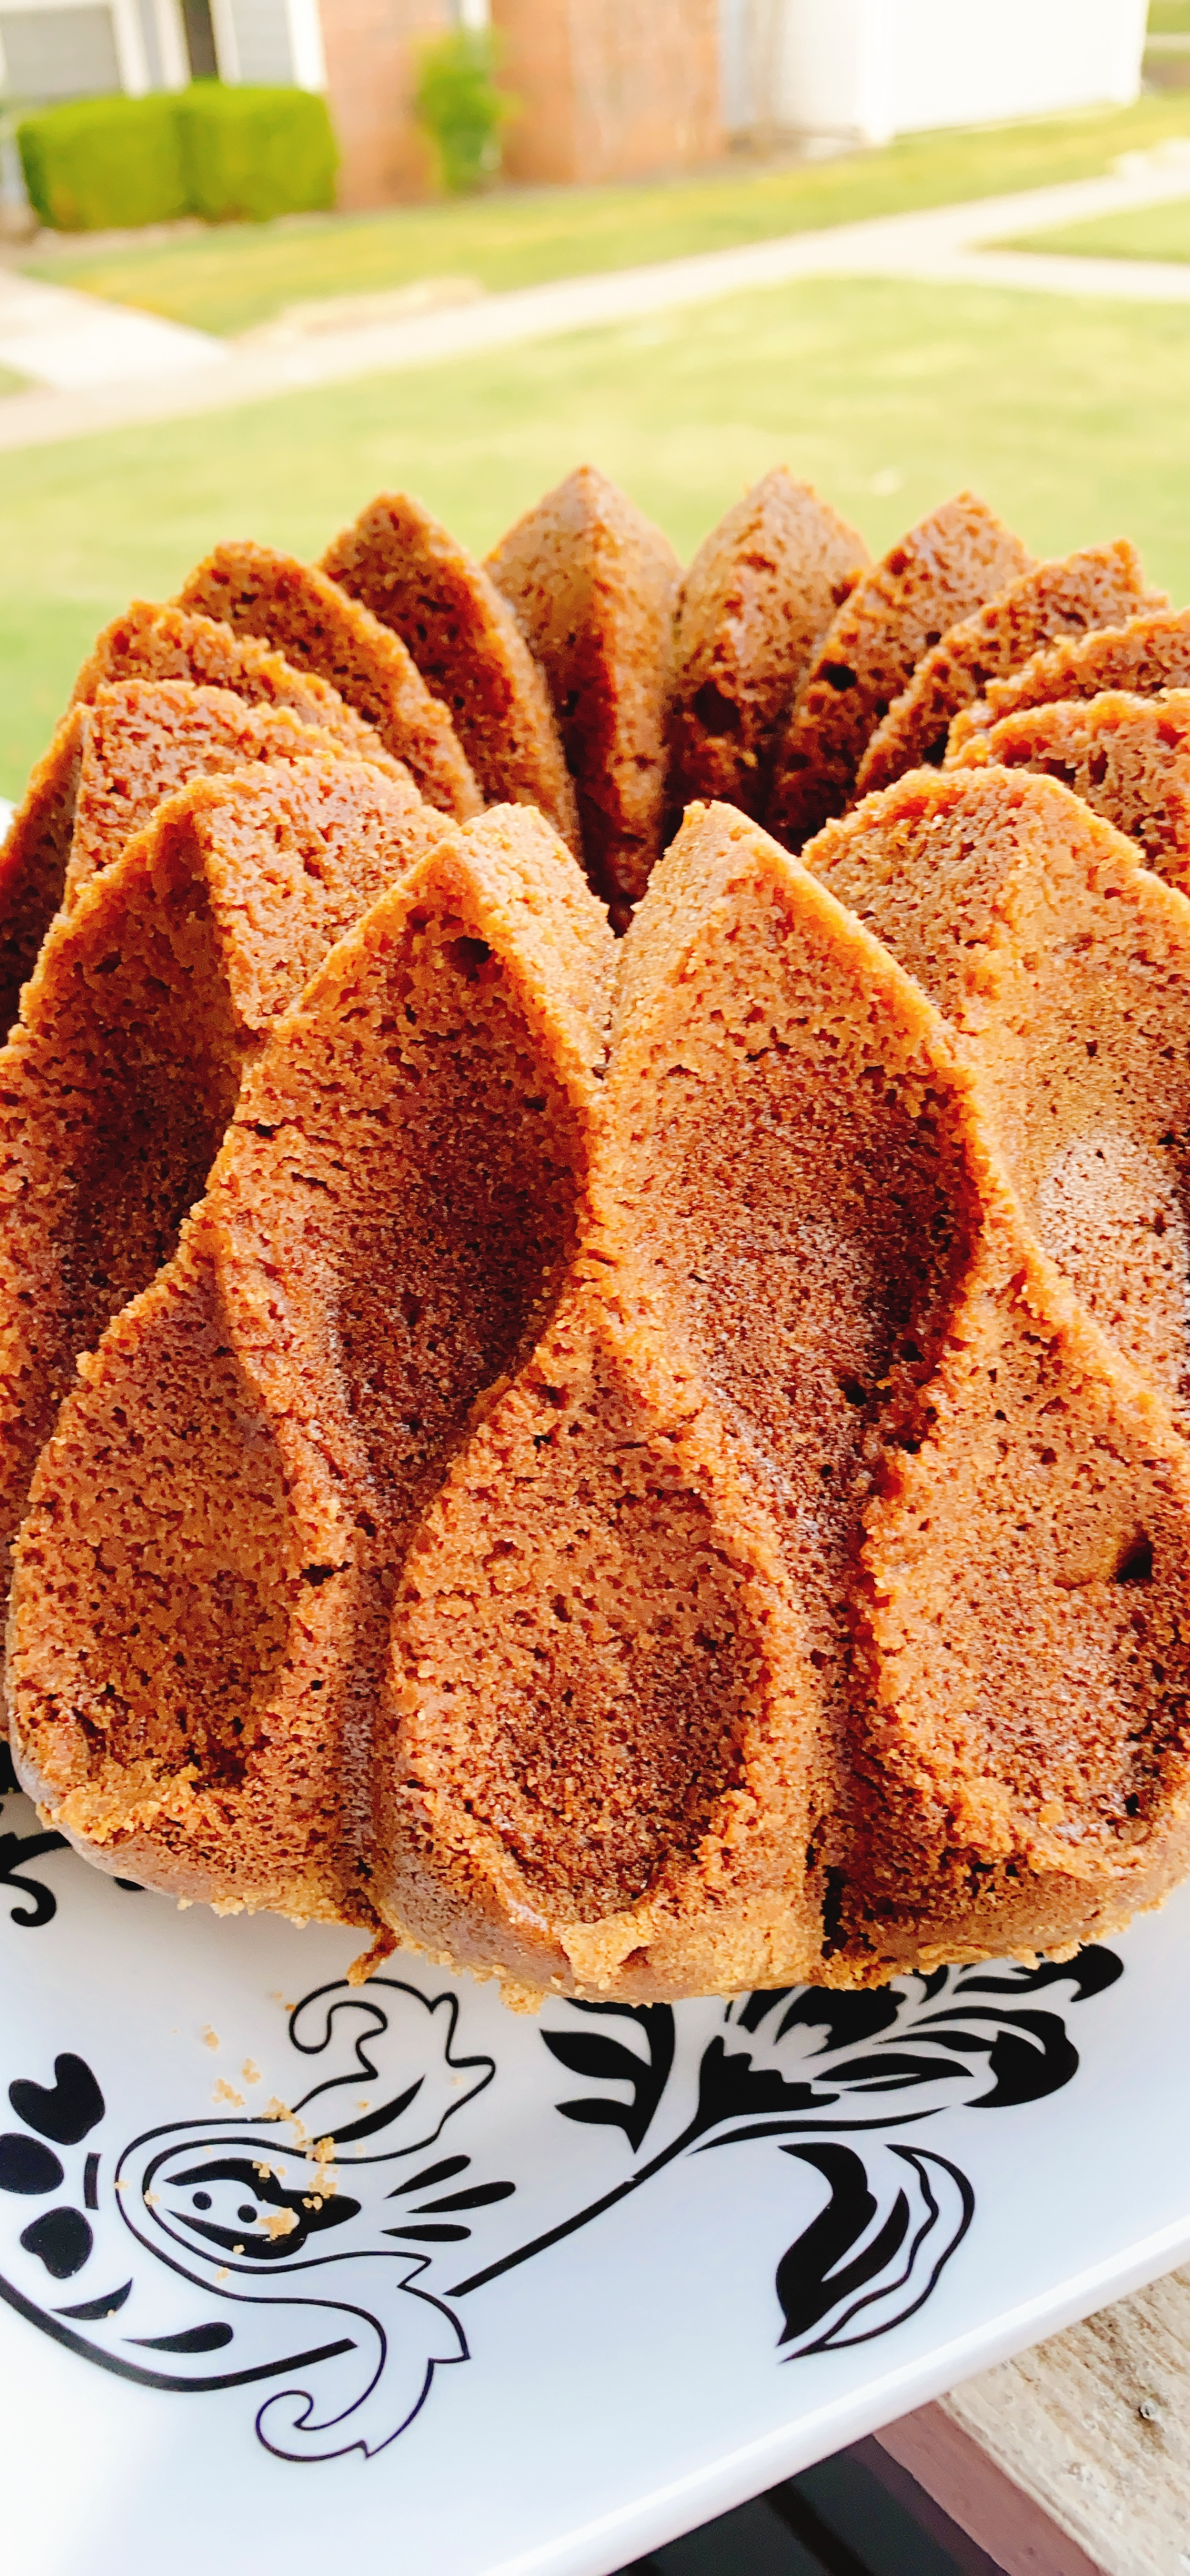 Cinnamon-Pumpkin Streusel Bundt® Cake